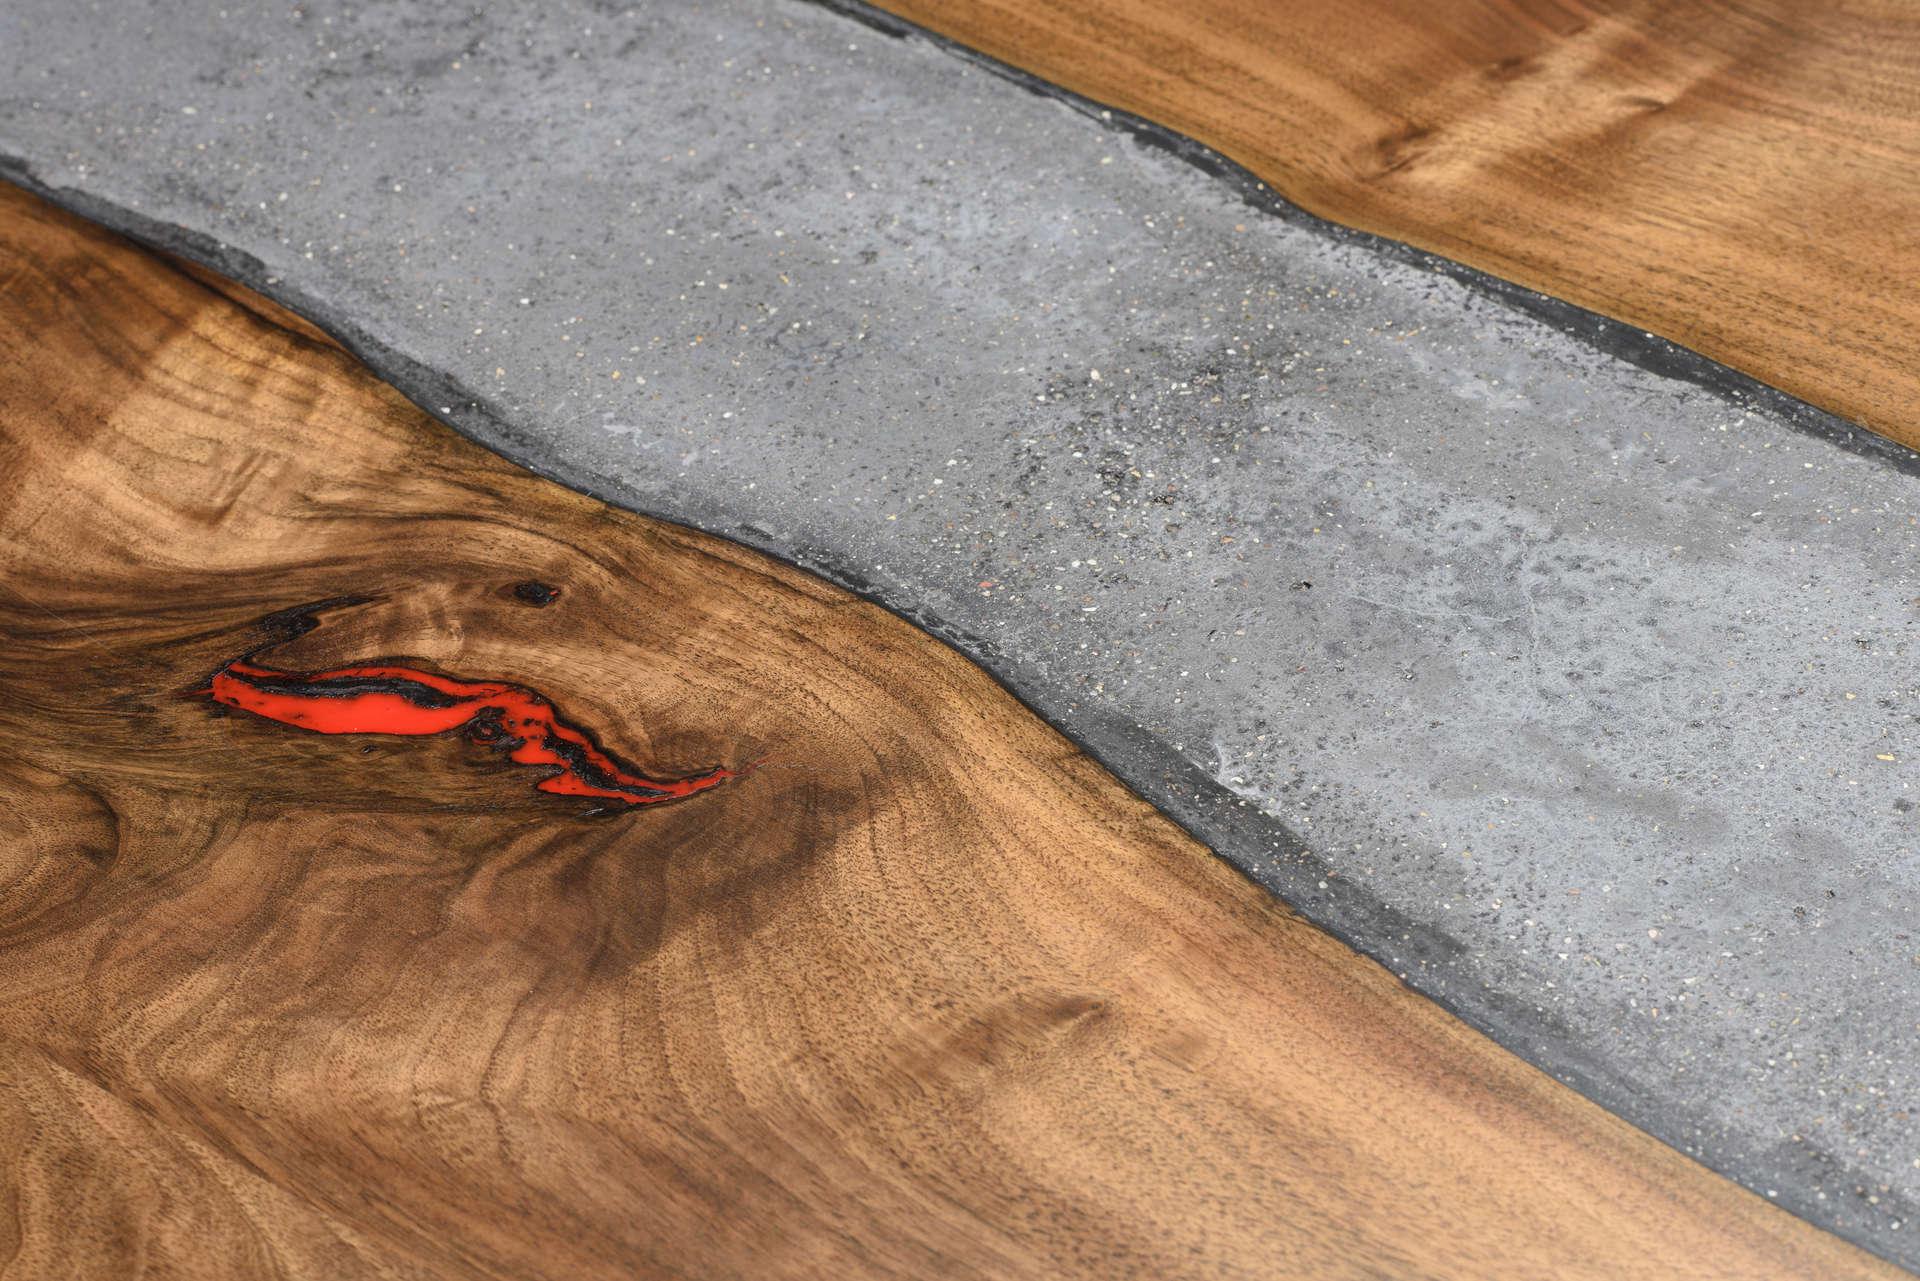 Beton in Nussholz Tischplatte mit rotem Resin Inlay.